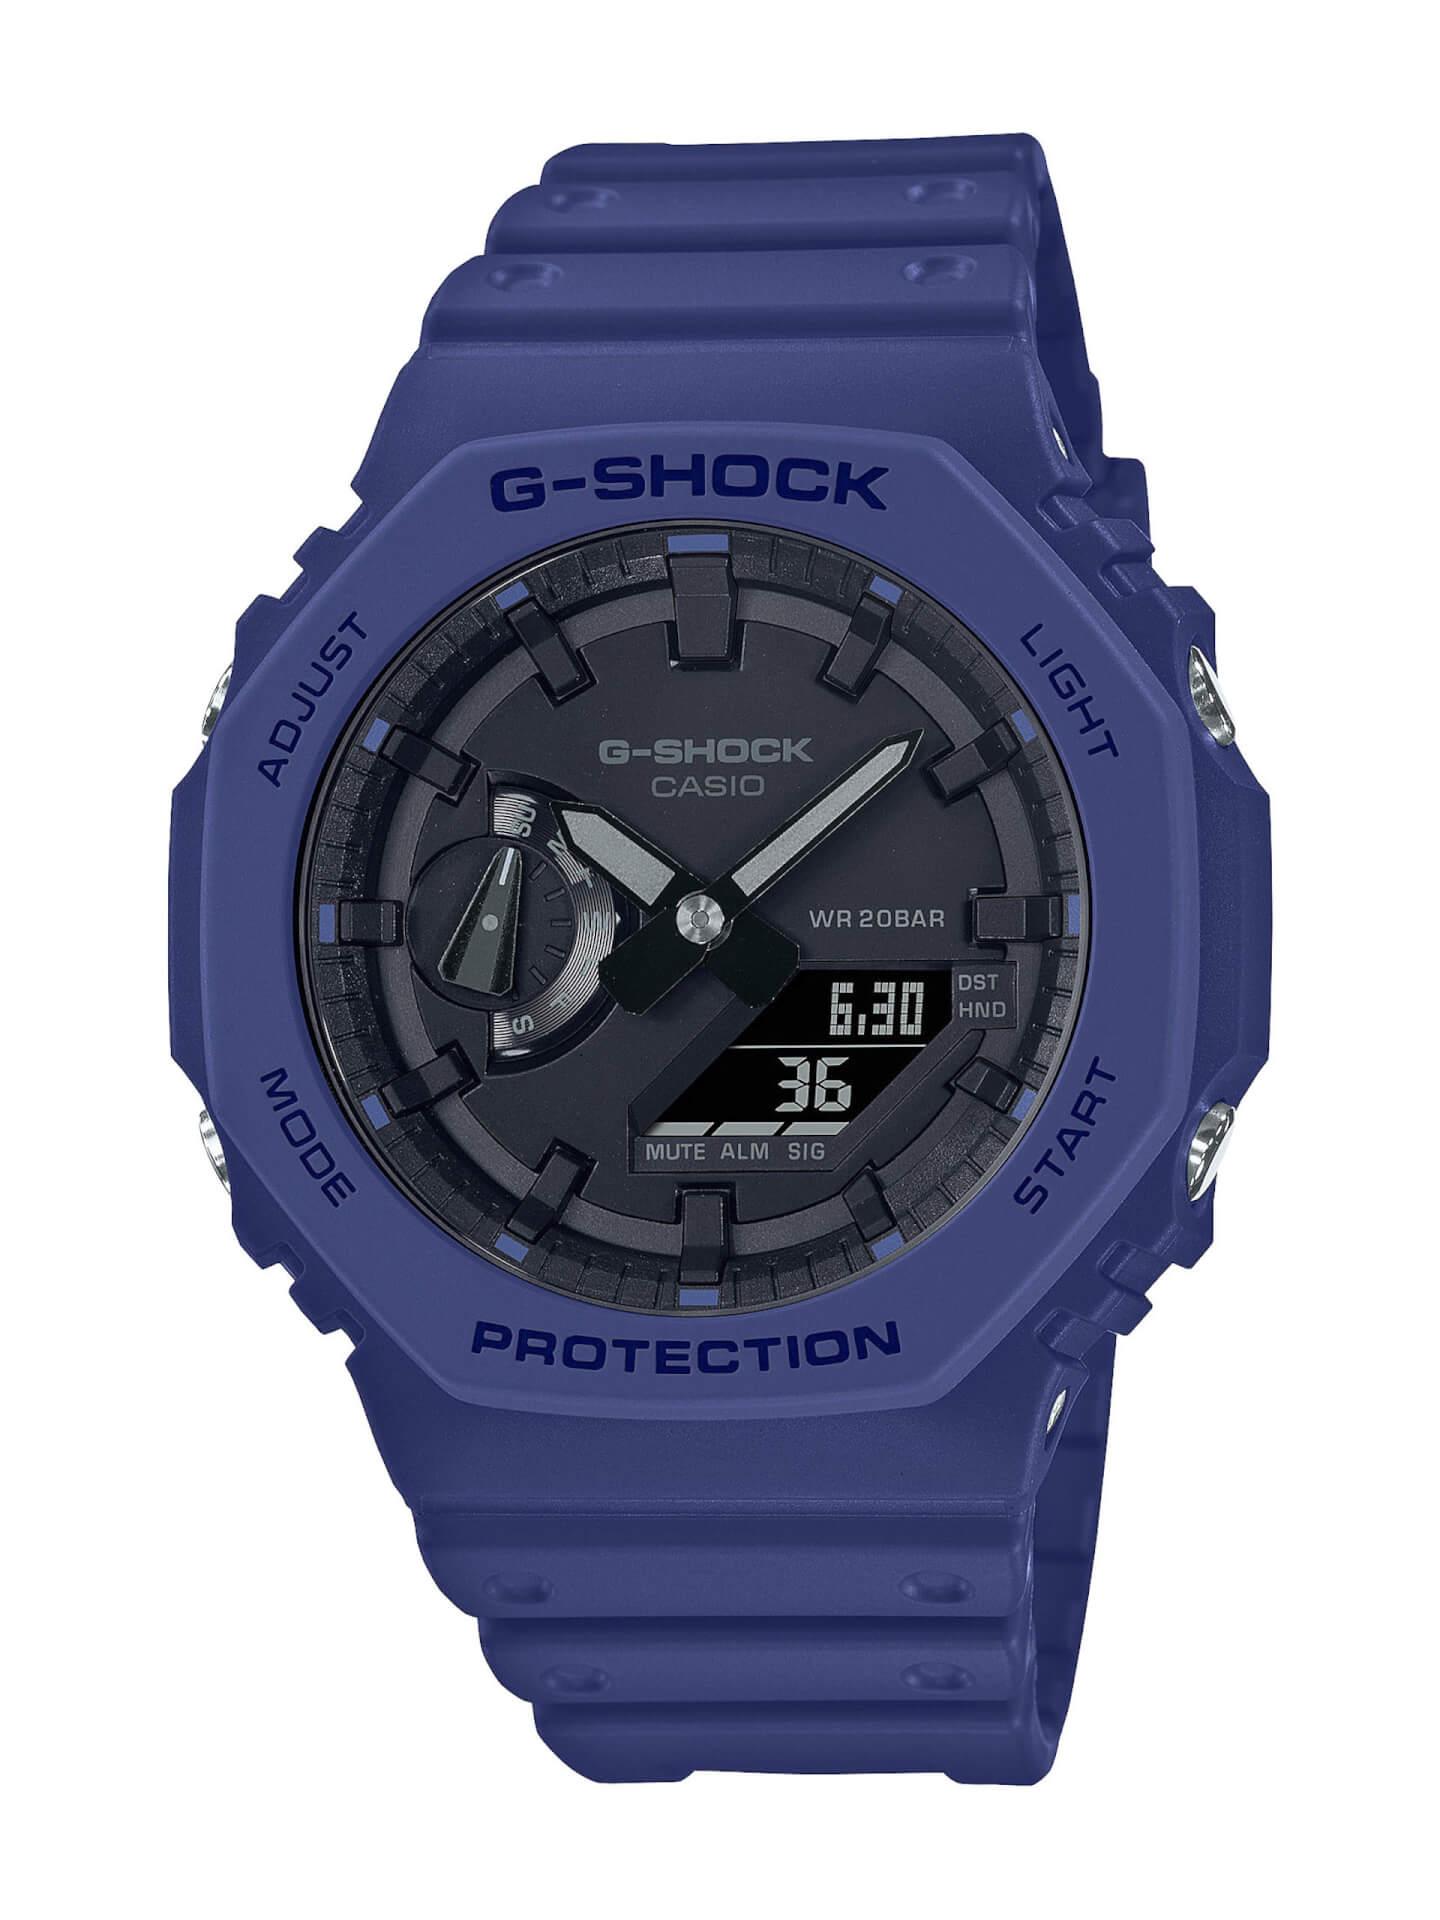 G-SHOCK「GA-2100」シリーズにクラシカルなネイビー、ベージュ、ホワイトの3カラーが登場! tech210805_gshock_ga2100_1